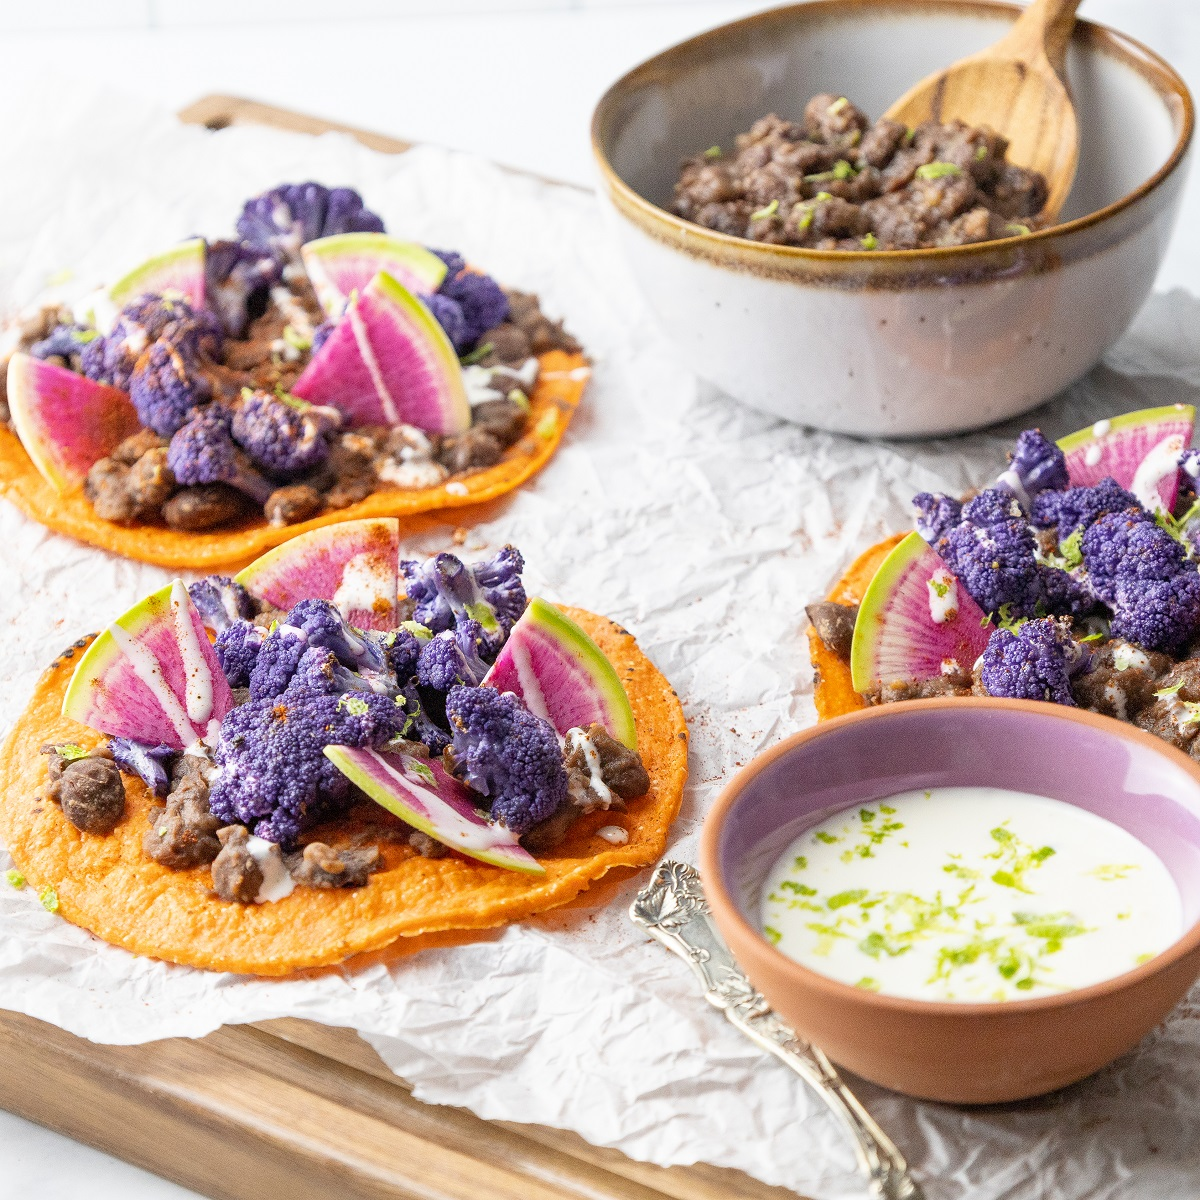 Tostadas with Purple Cauliflower and Black Beans 1x1 45